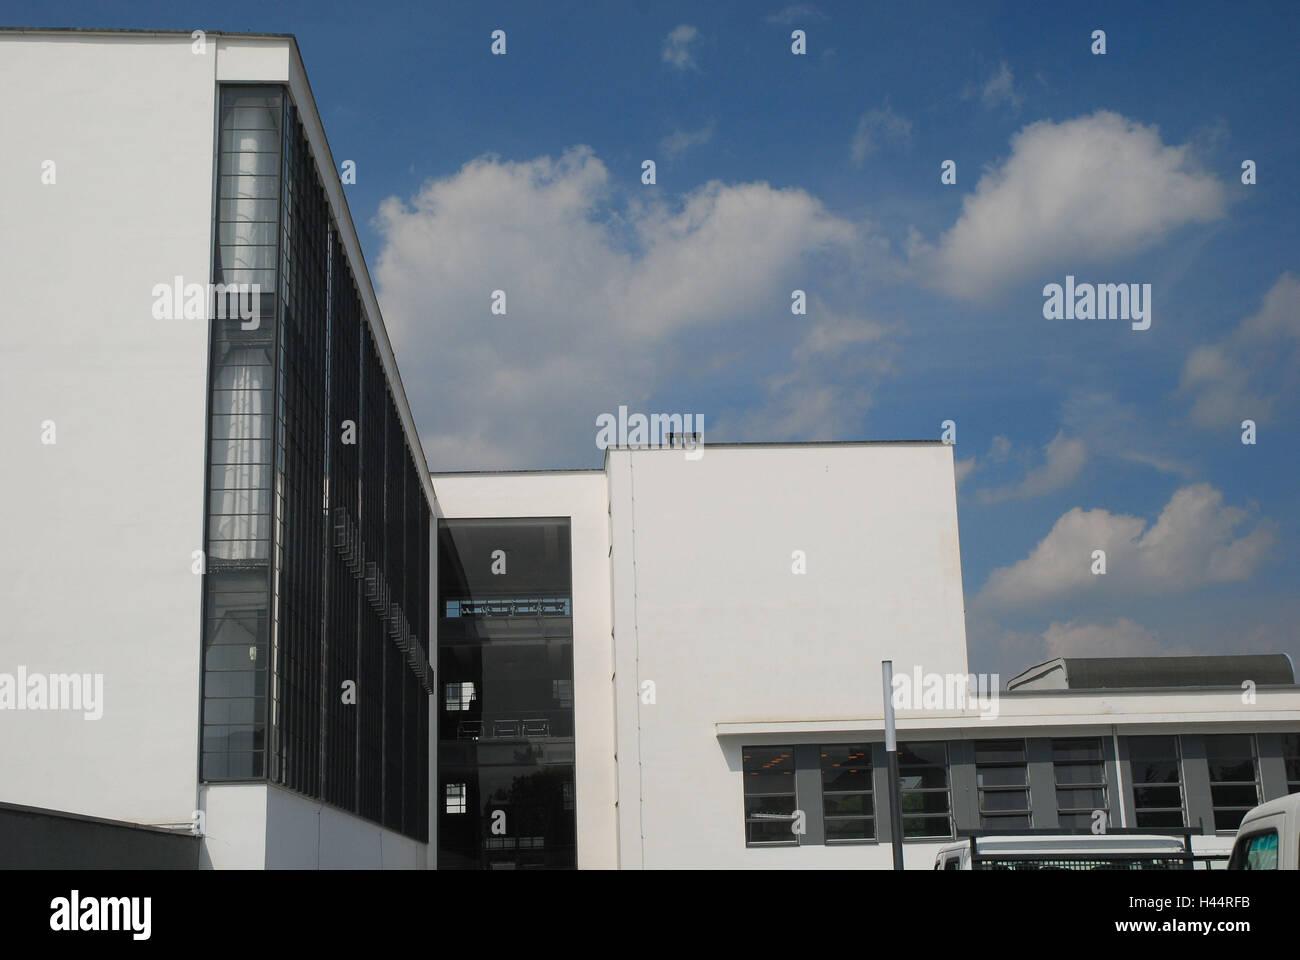 Germany, Saxony-Anhalt, Dessau-Rosslau, Bauhaus, Stock Photo